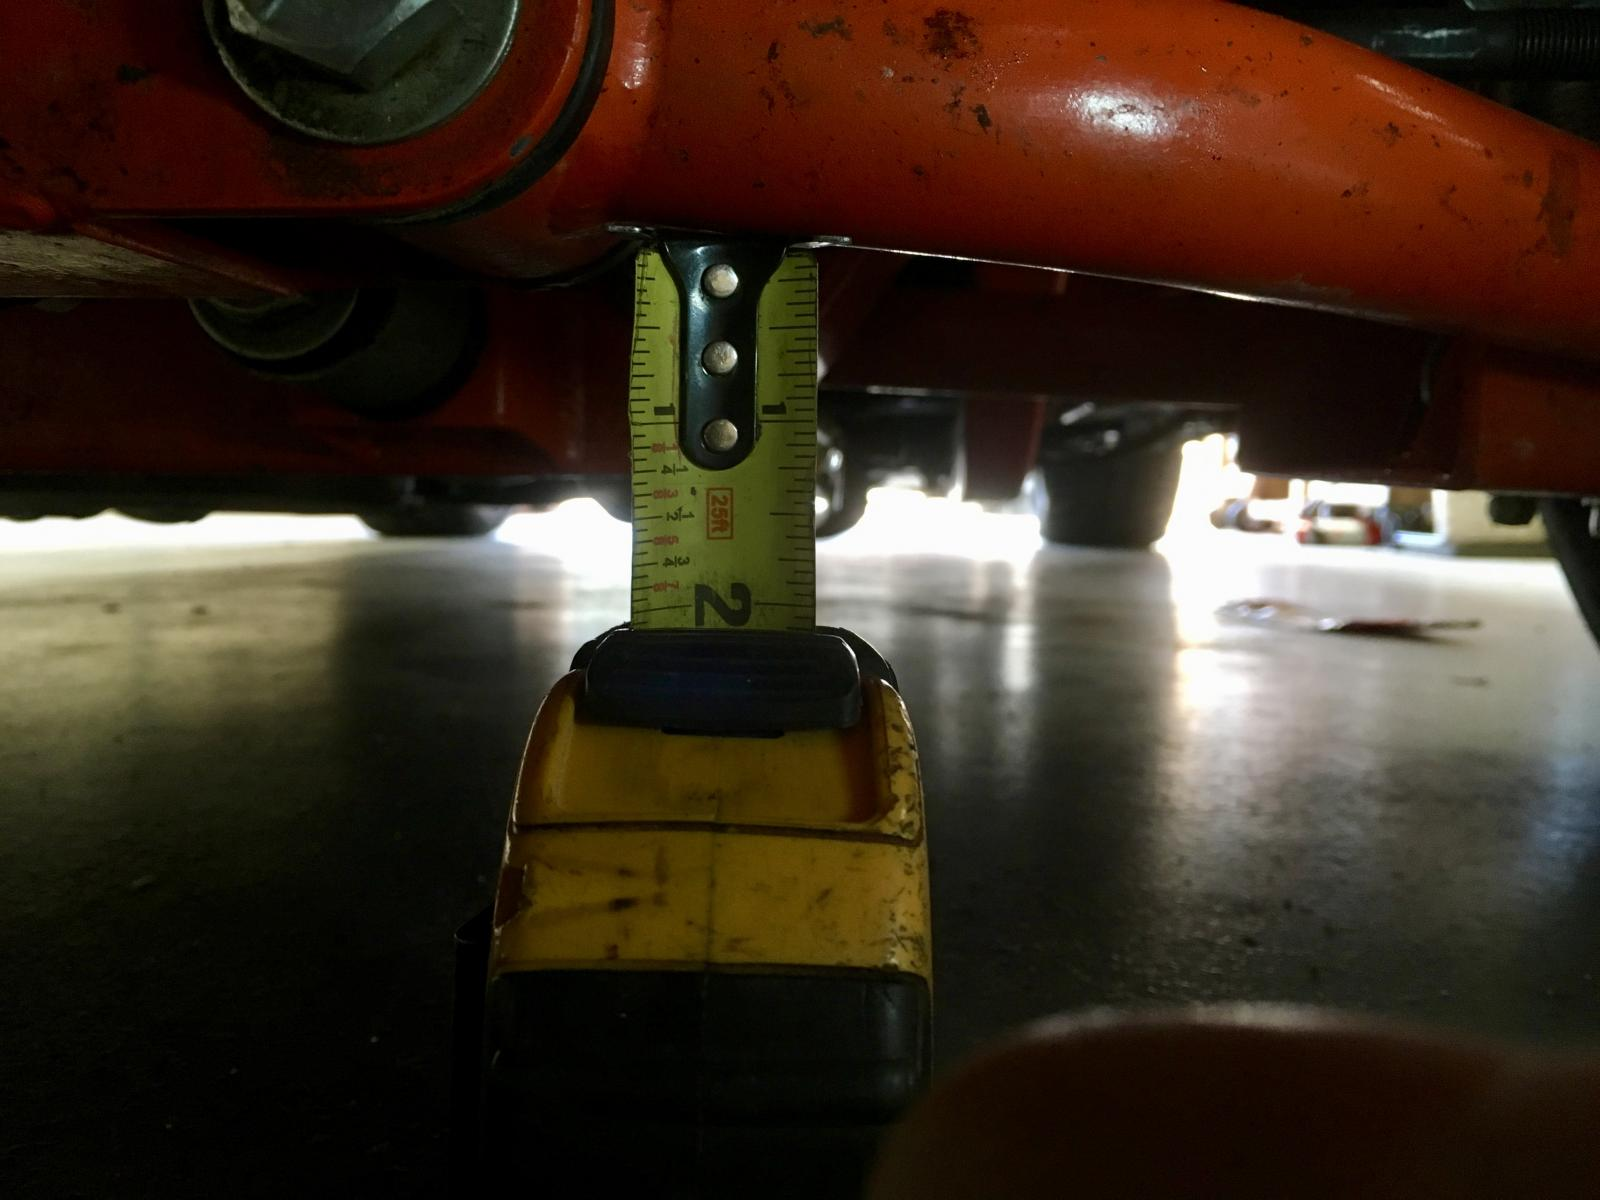 1967 Camaro Heidts Pro-G subframe ride height too low  Help!!